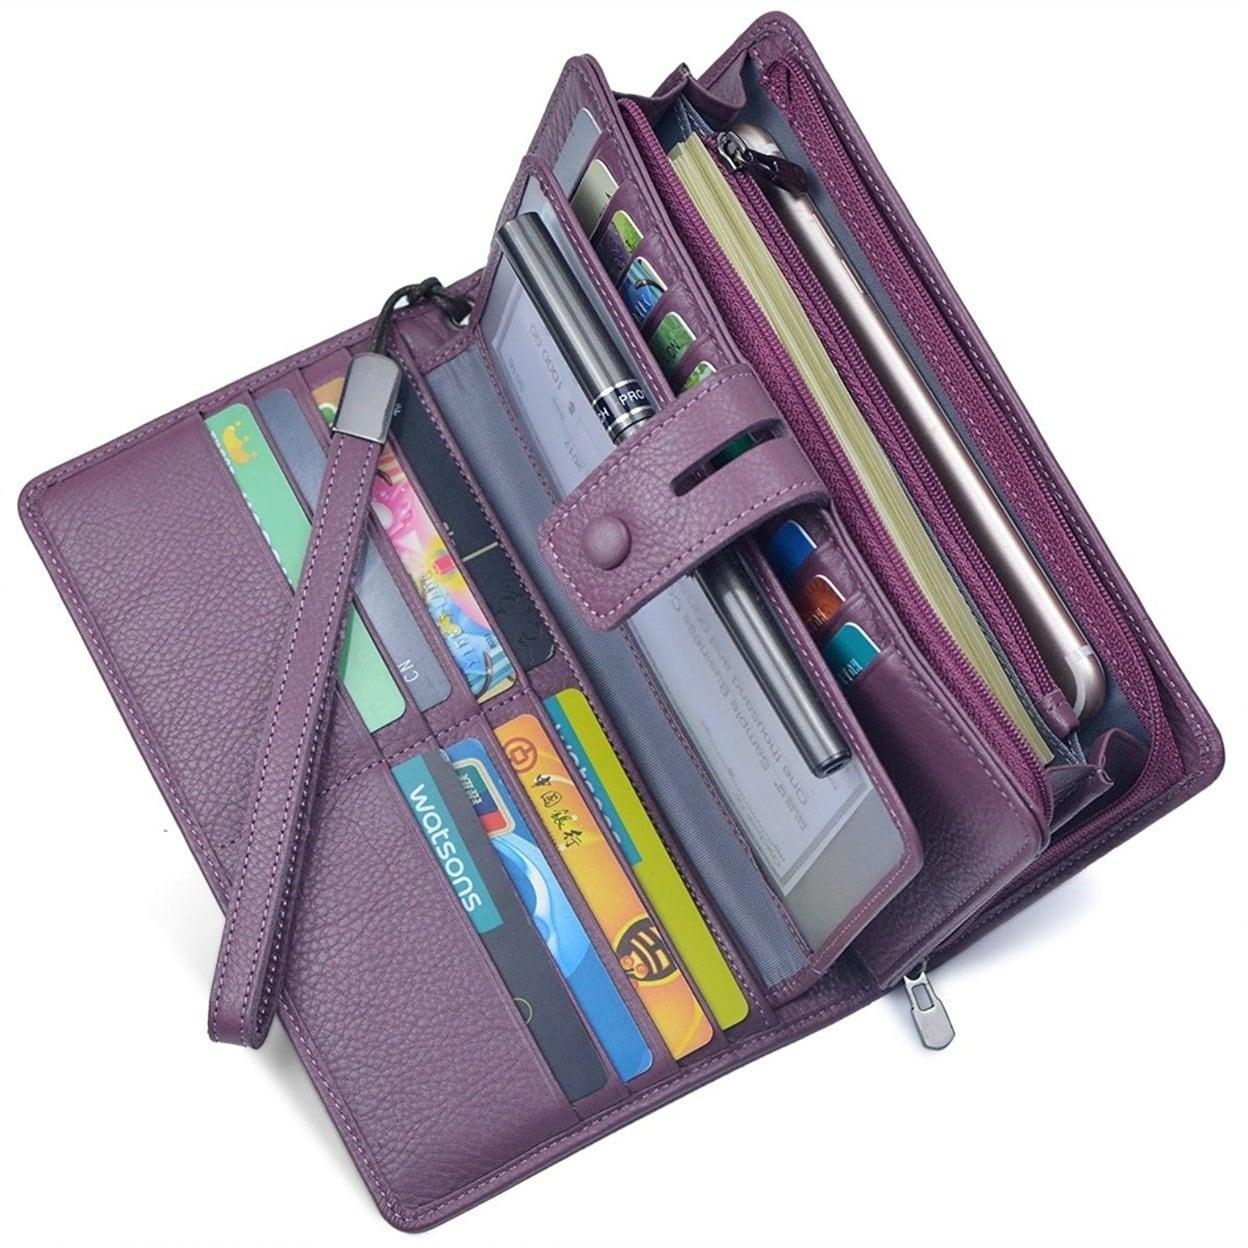 d910c1c69a33 Buy Women's Wallets Online at Overstock | Our Best Wallets Deals